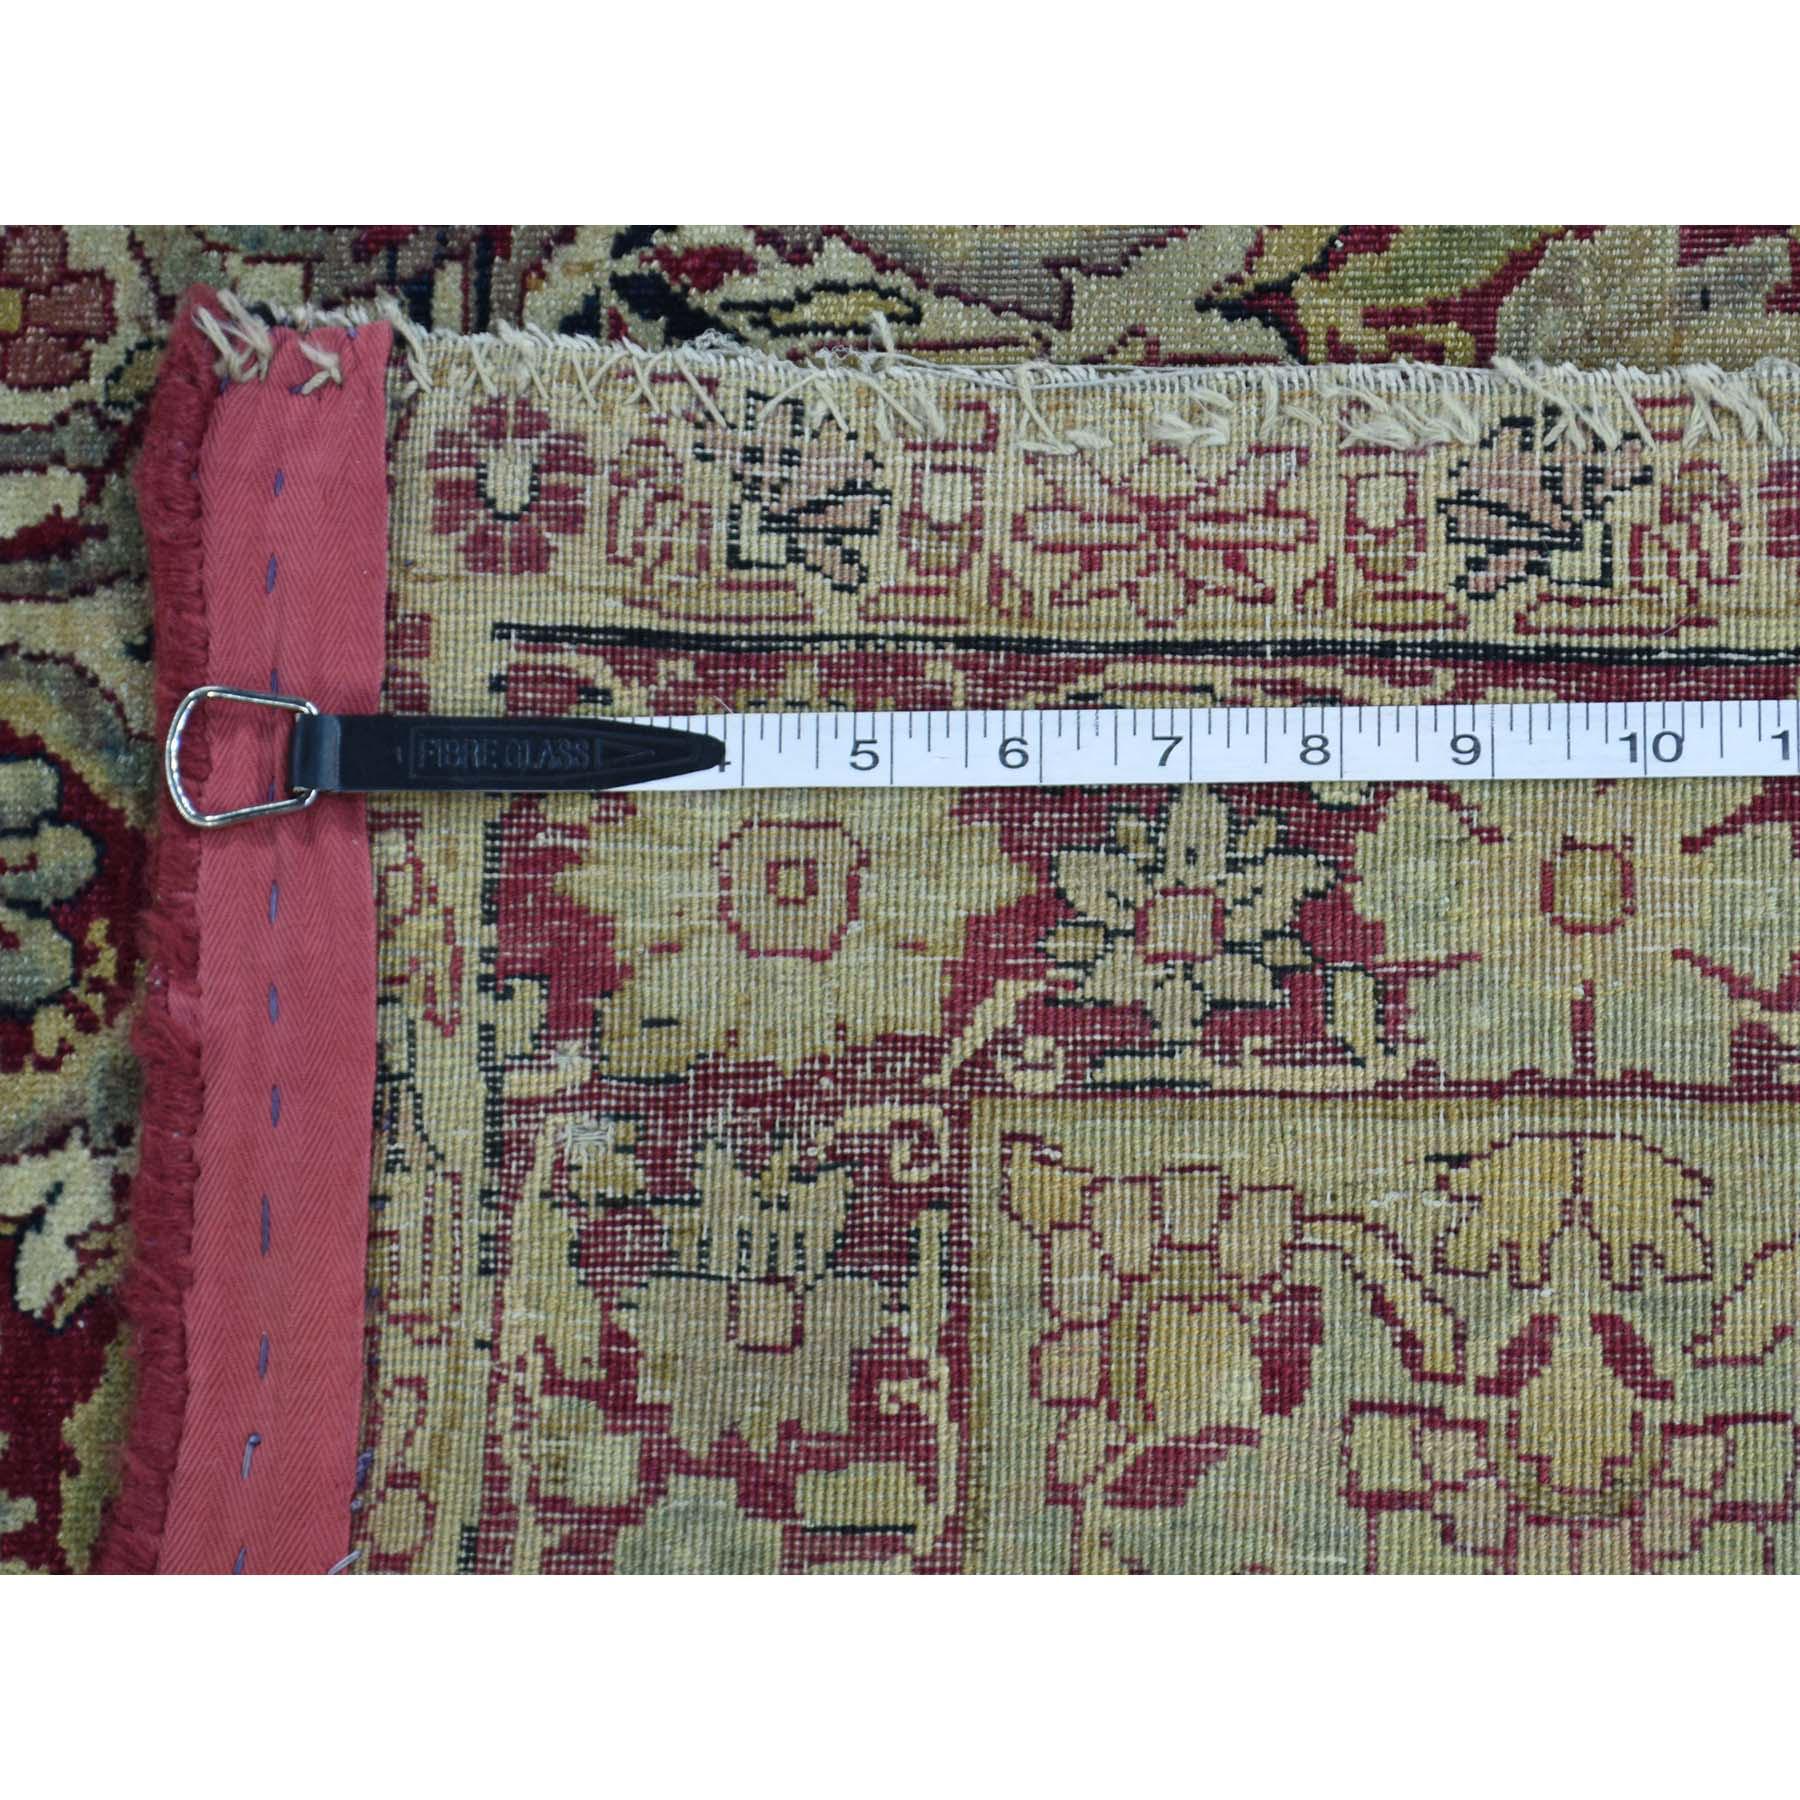 10-9 x12- Antique Lavar Kerman with Natural Cranberry Dyes Oriental Rug